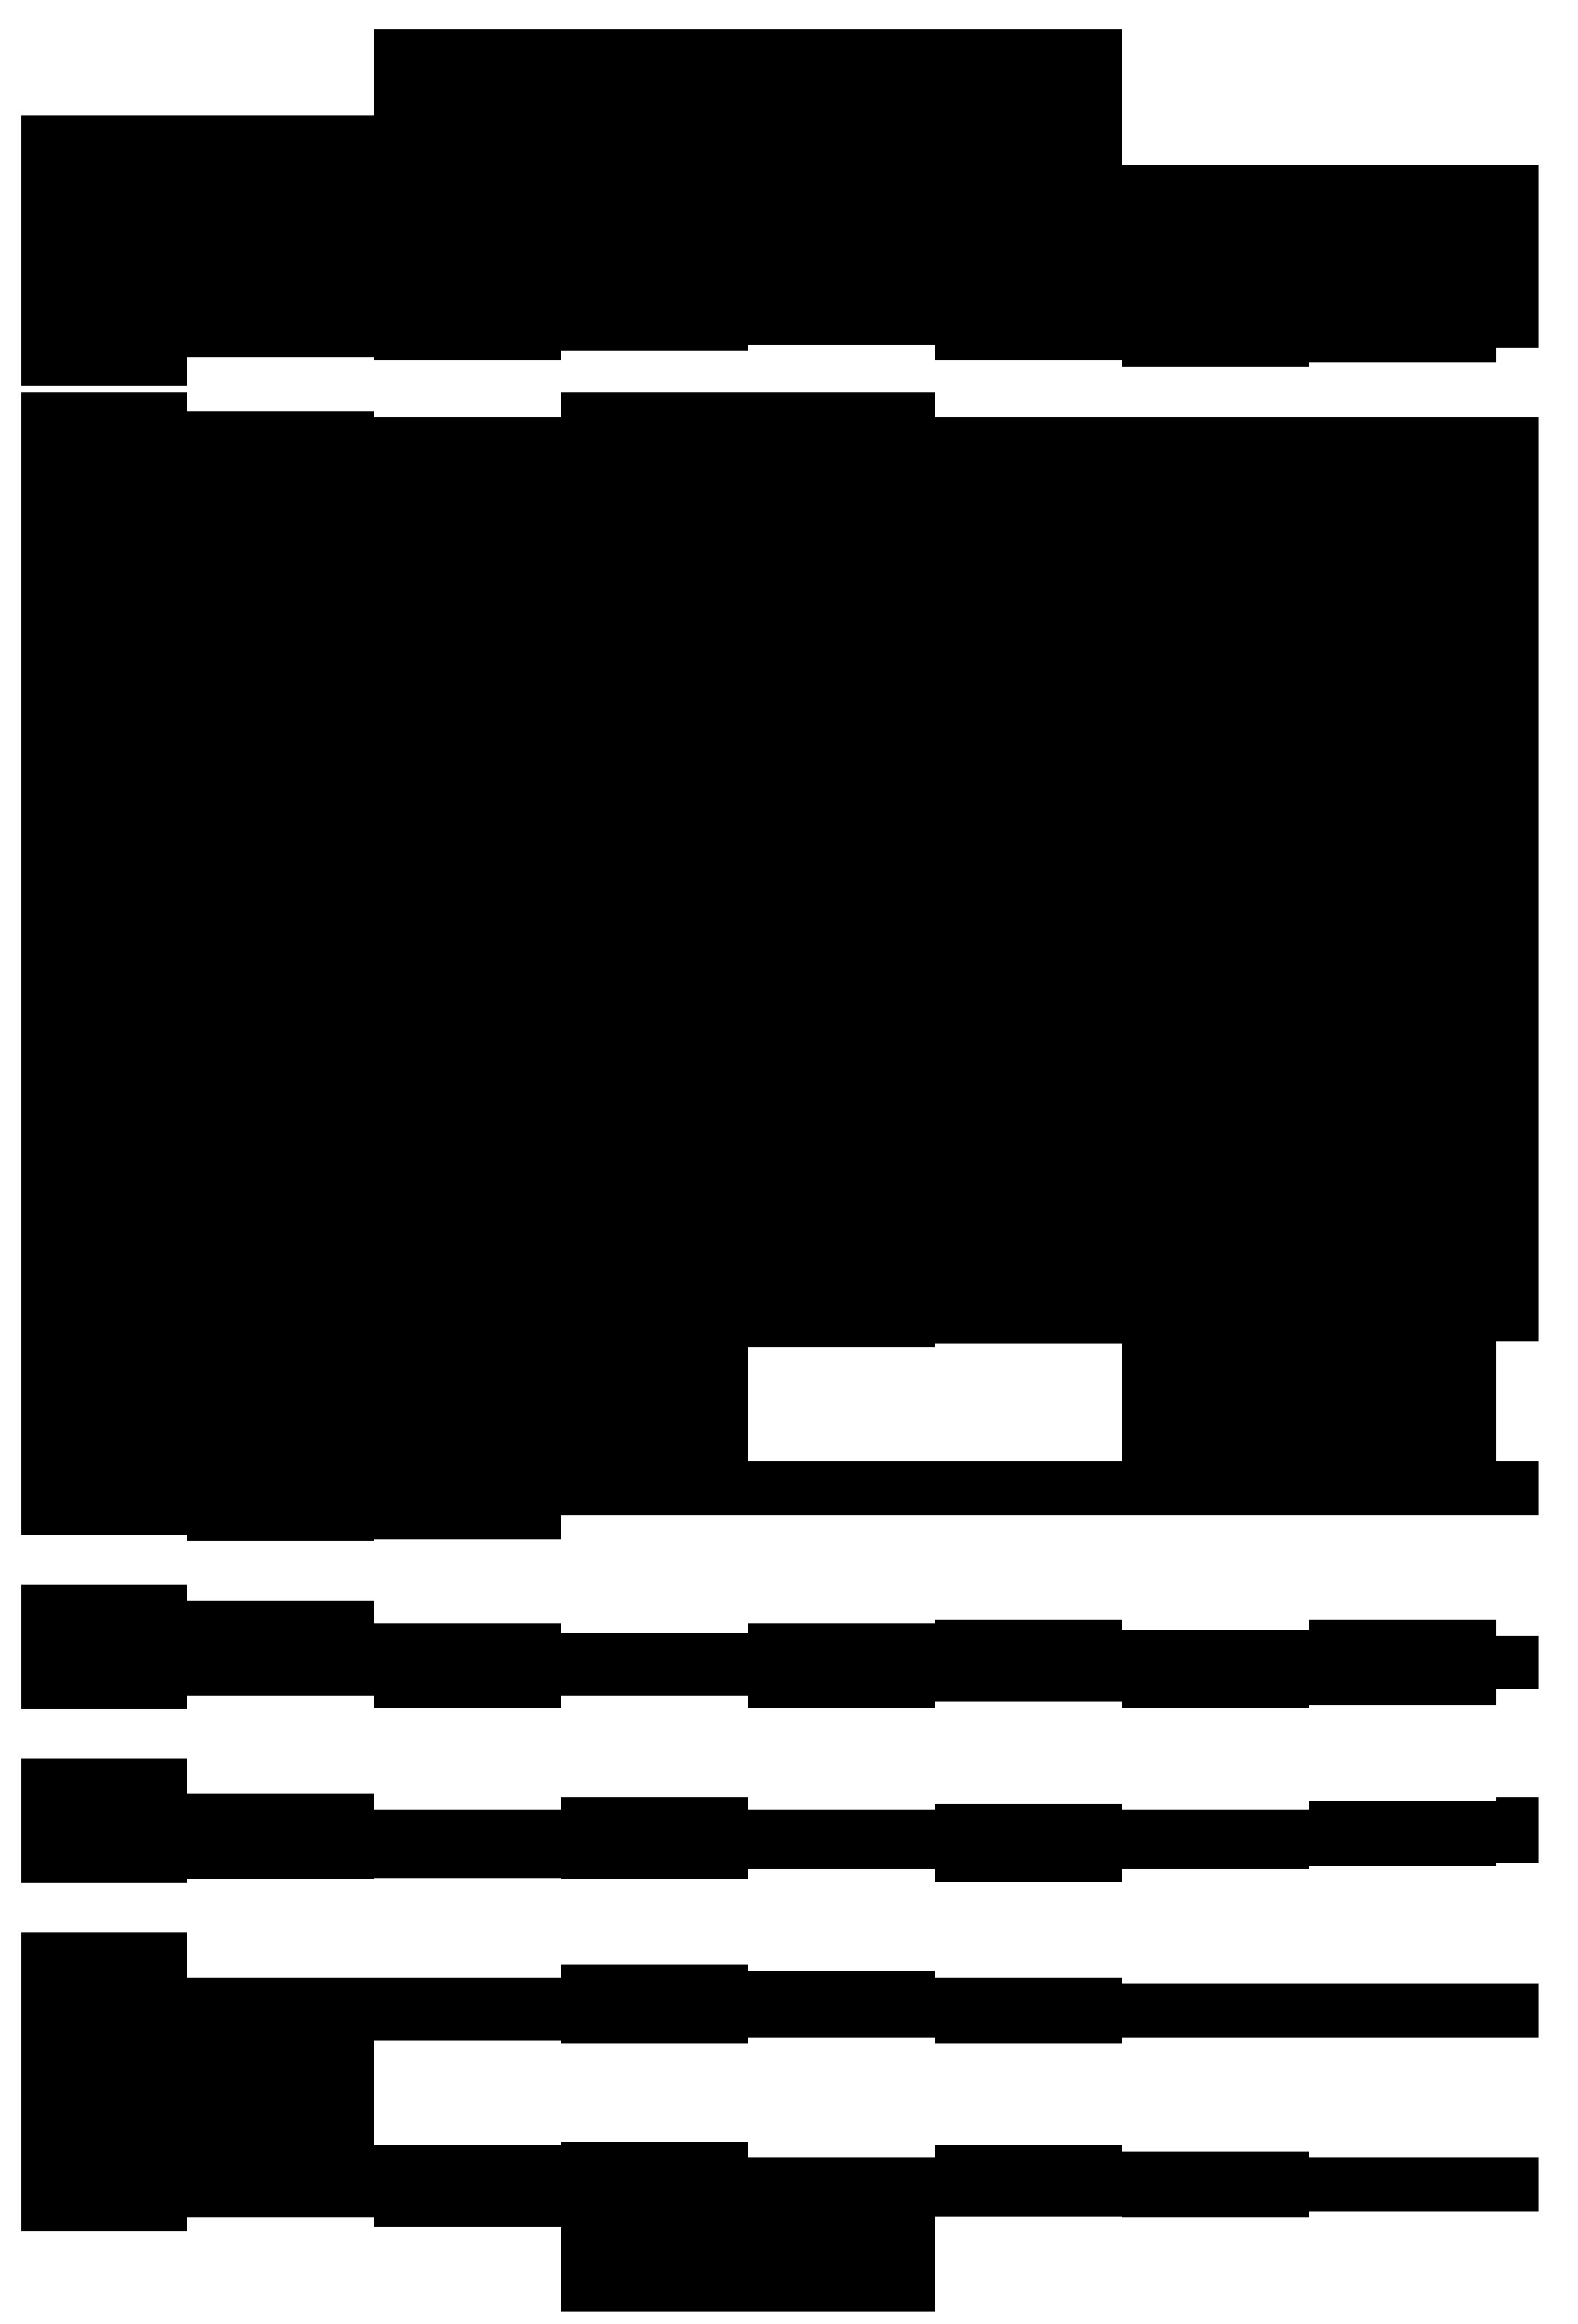 Enkla skalövningar 2 i D-dur